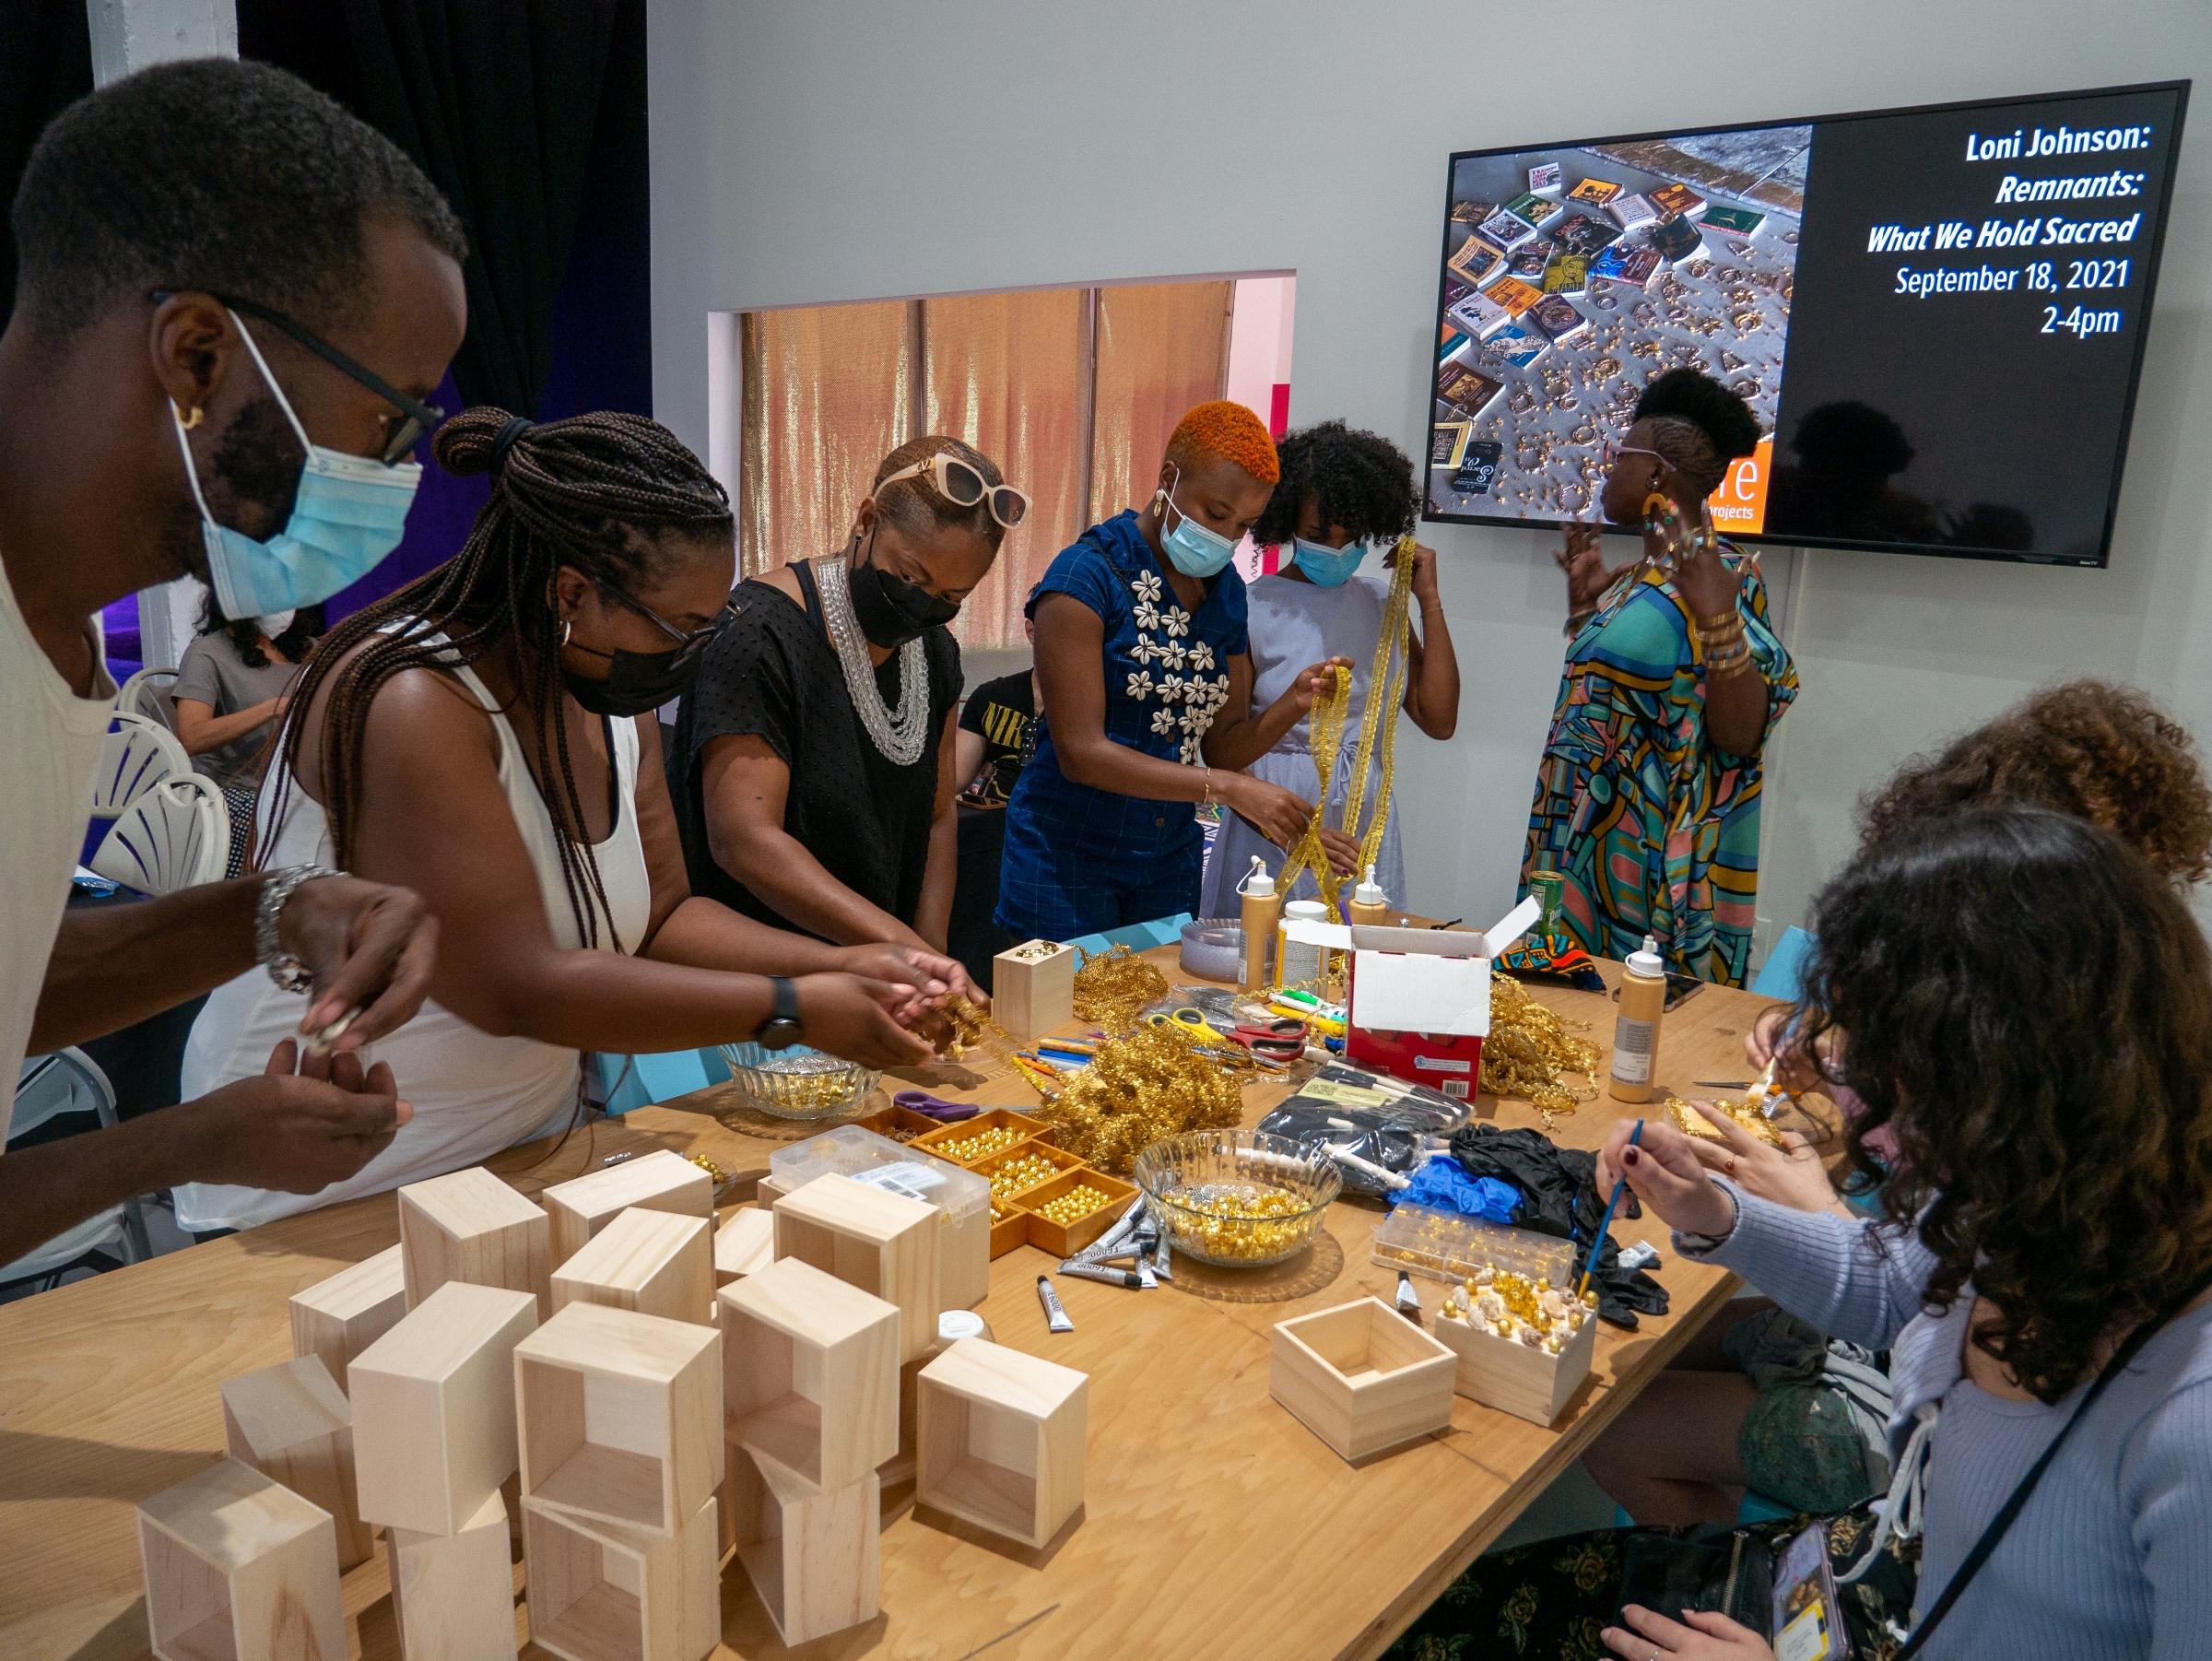 Altar-making Workshop with Loni Johnson